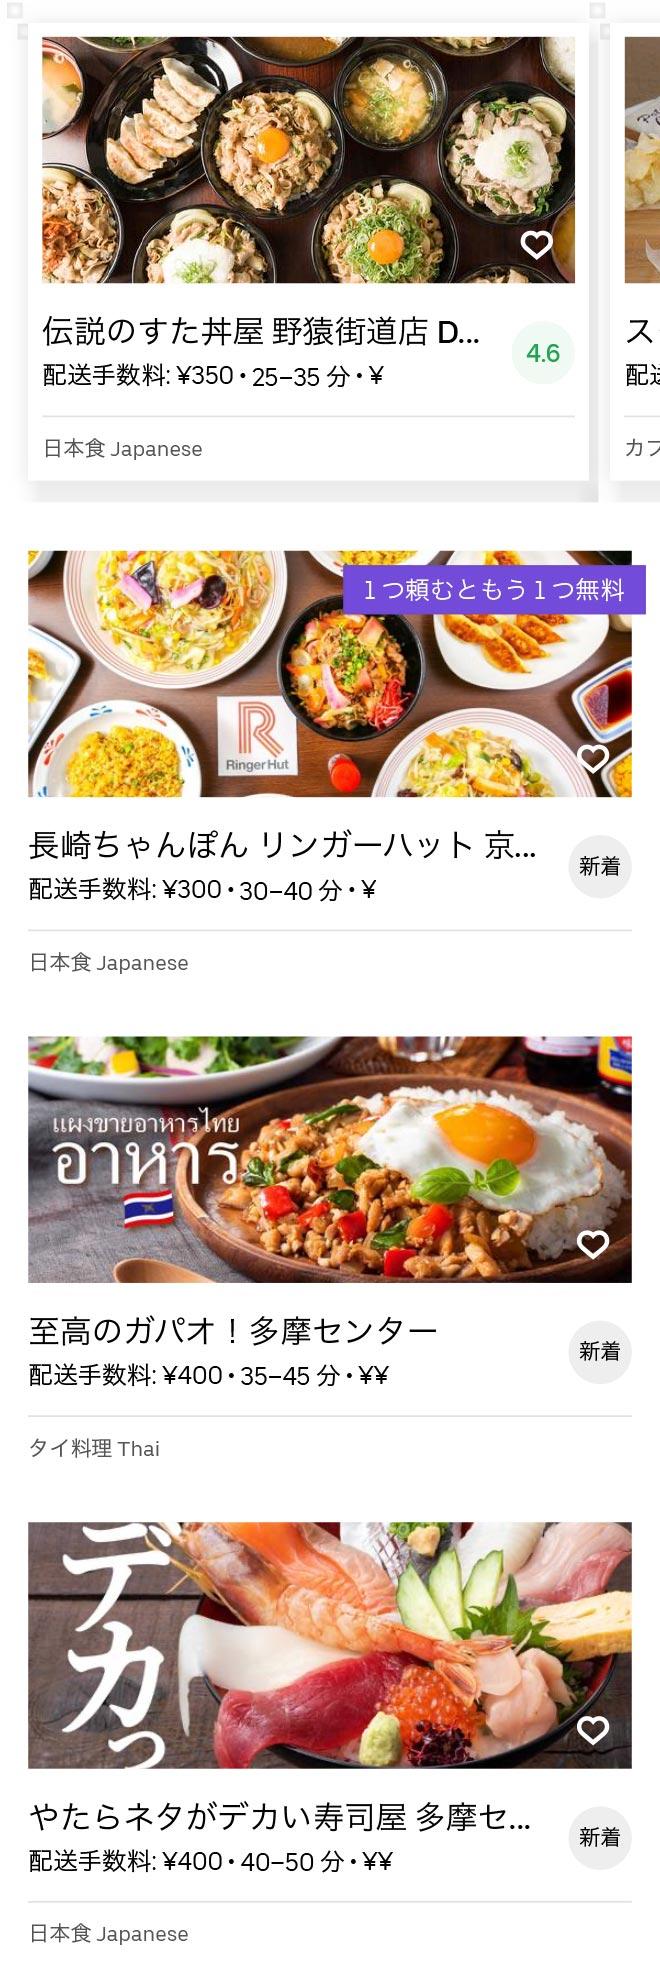 Seiseki menu 2007 02